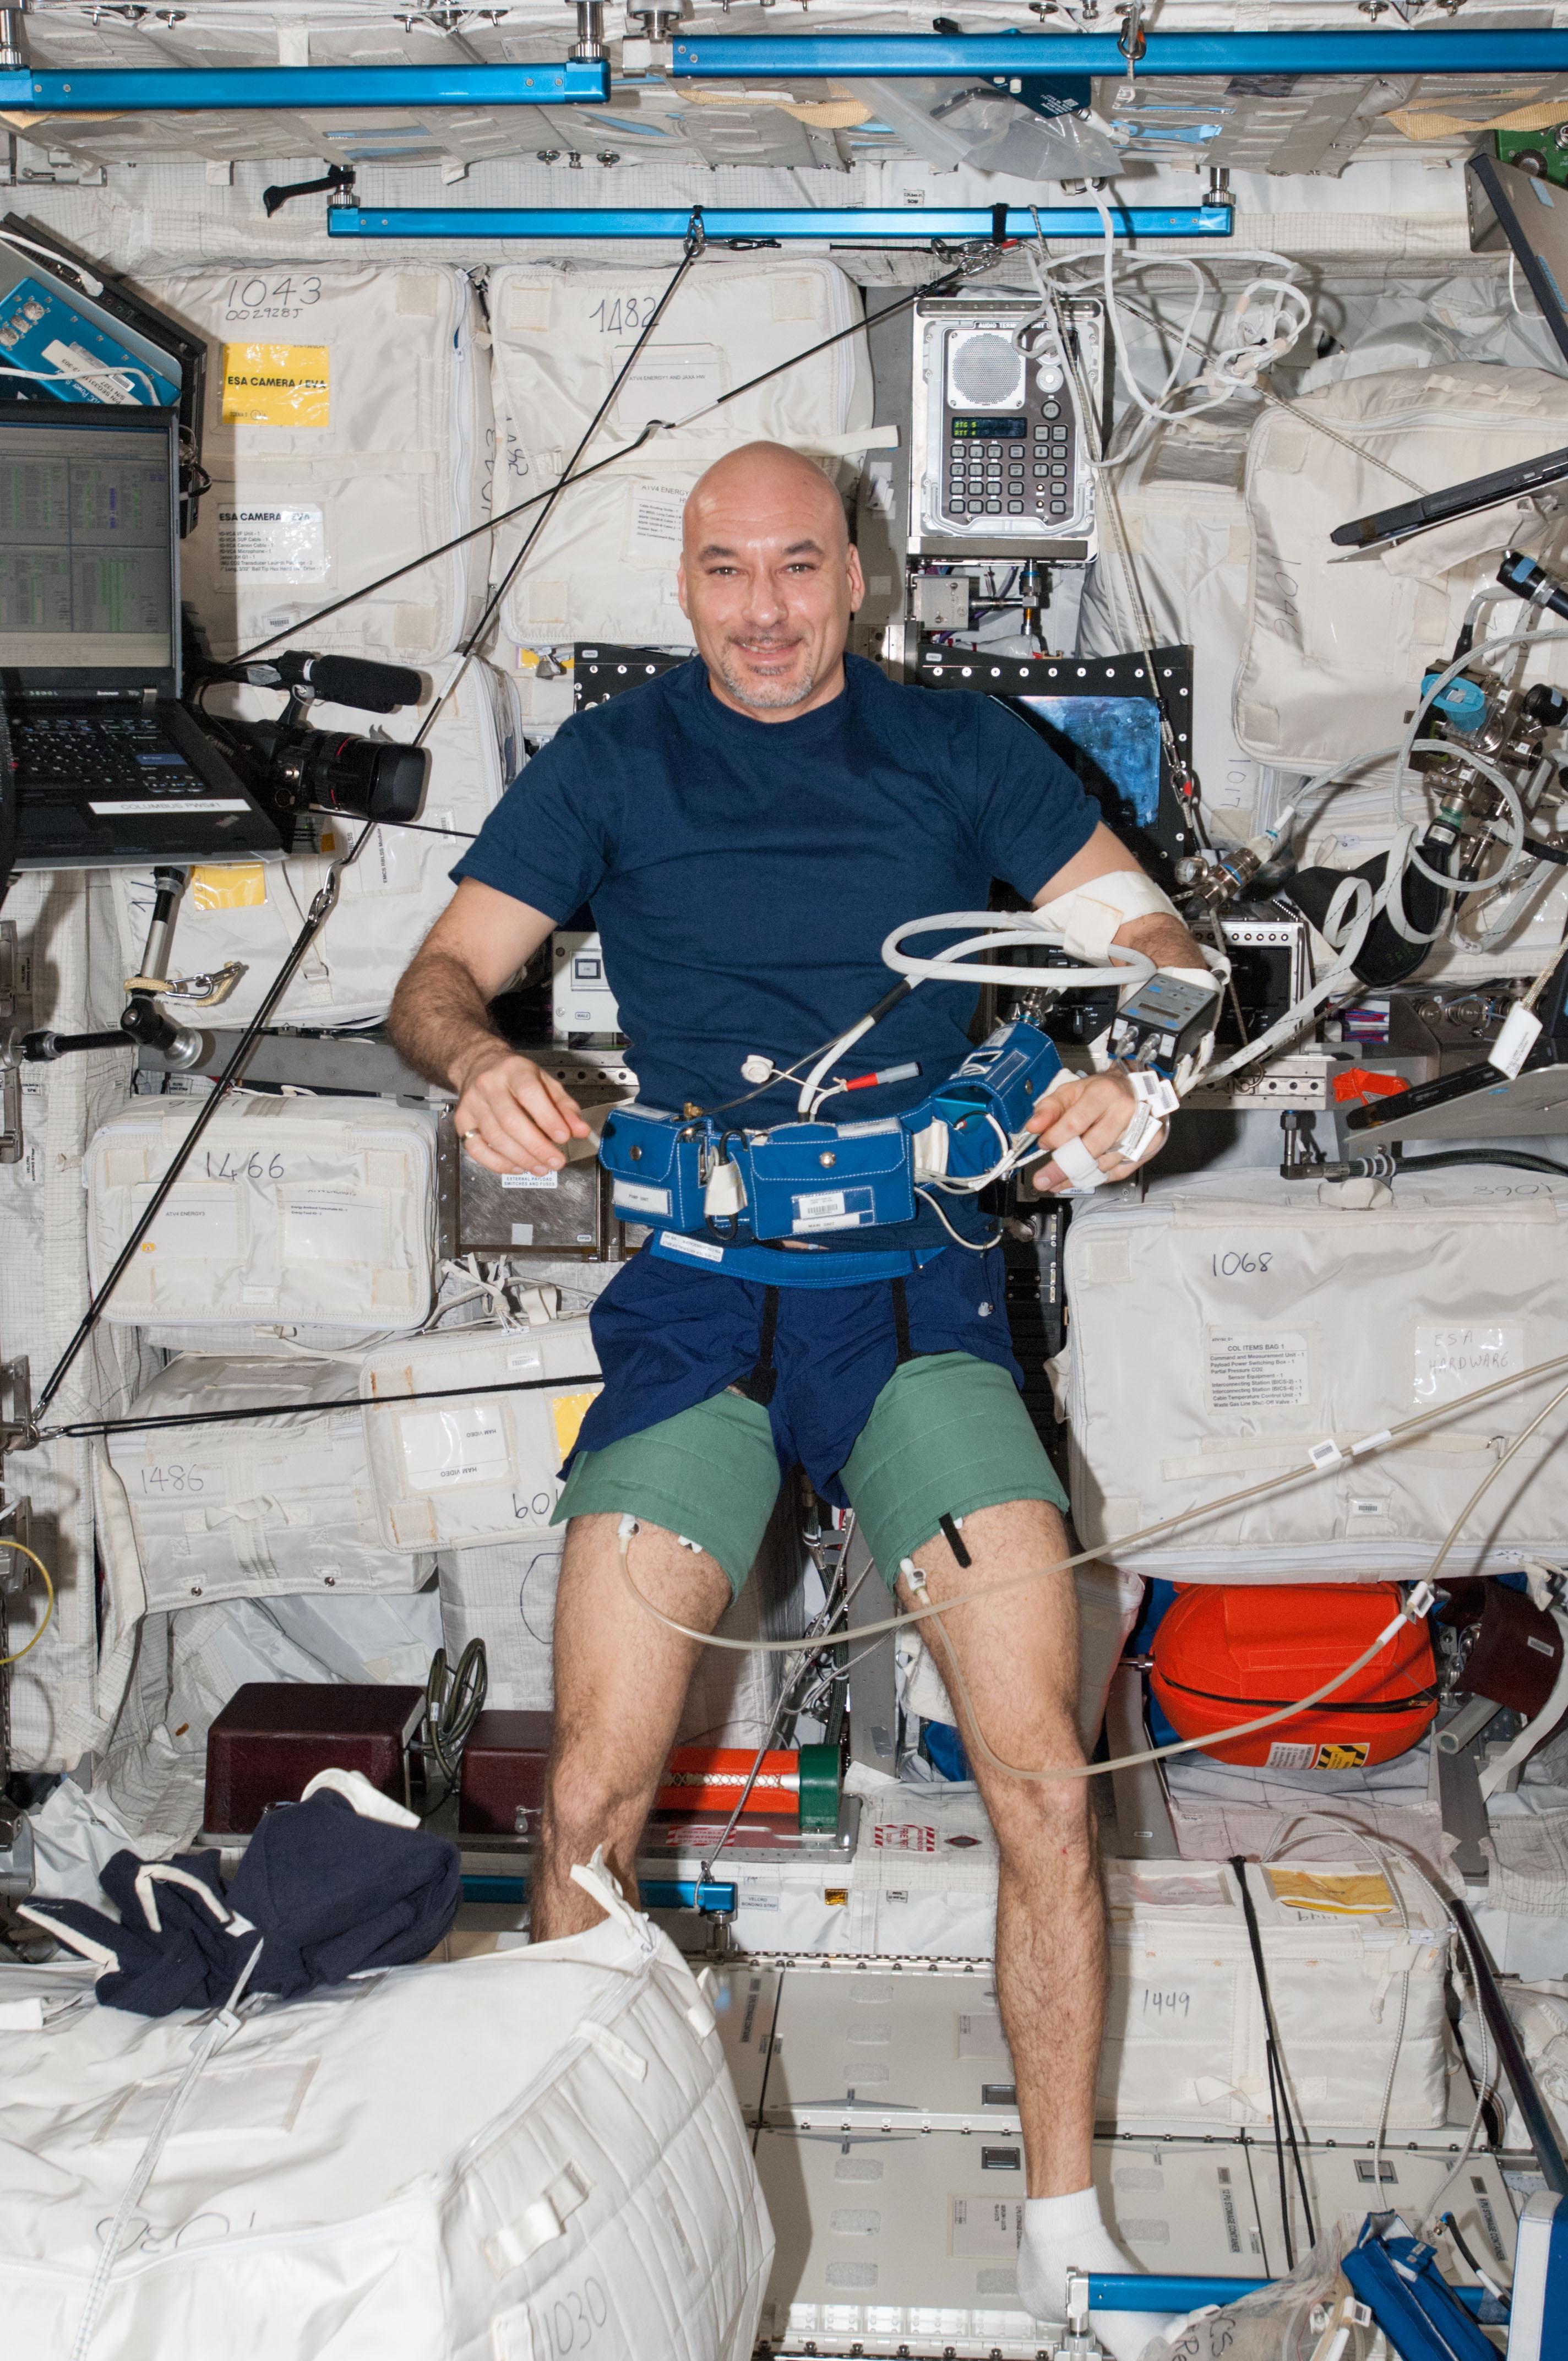 international space station italian astronaut - photo #19